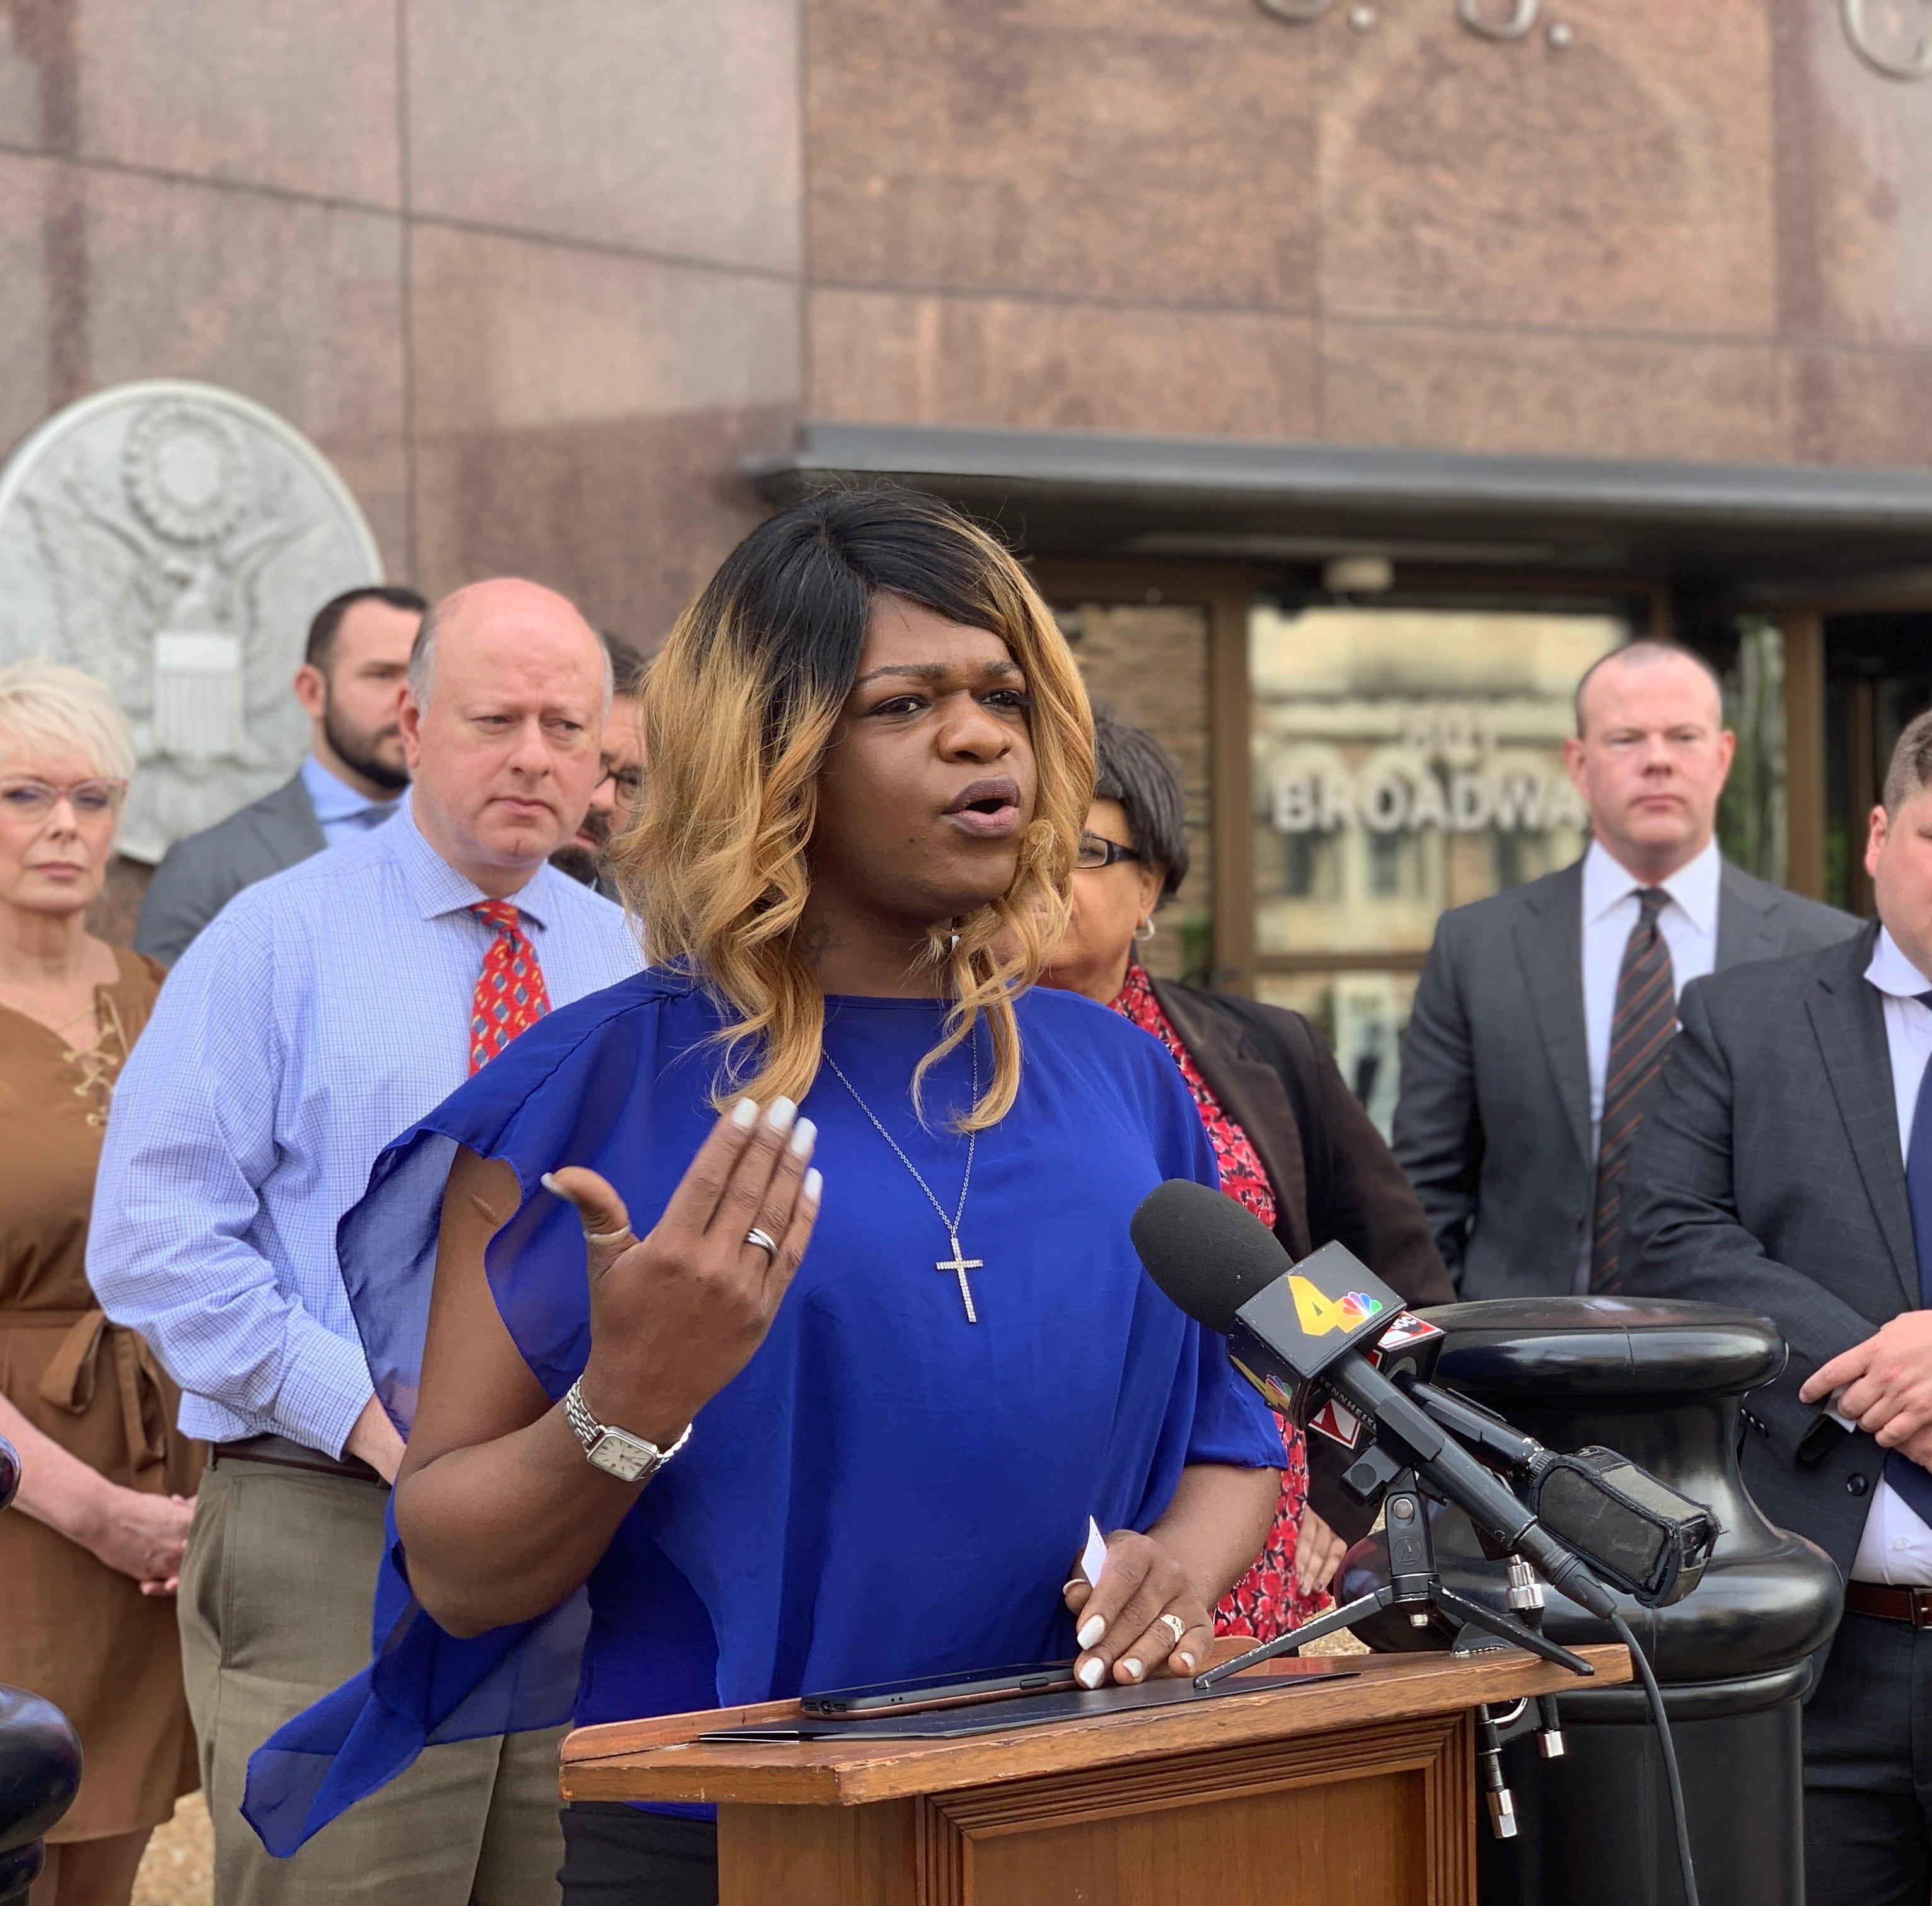 Transgender individuals file lawsuit regarding birth certificate policy